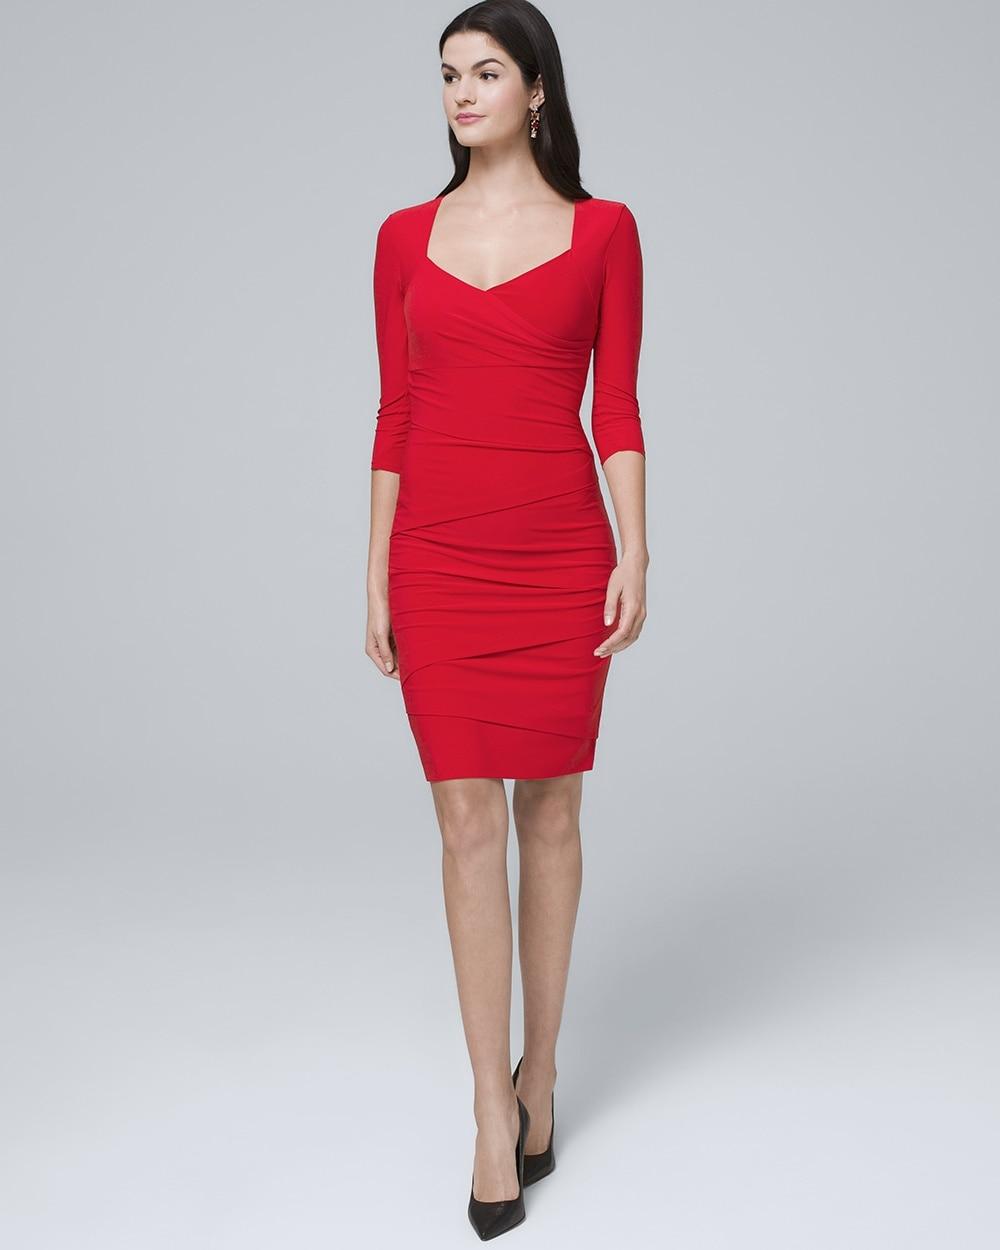 98bd656532c Instantly Slimming Sheath Dress - White House Black Market